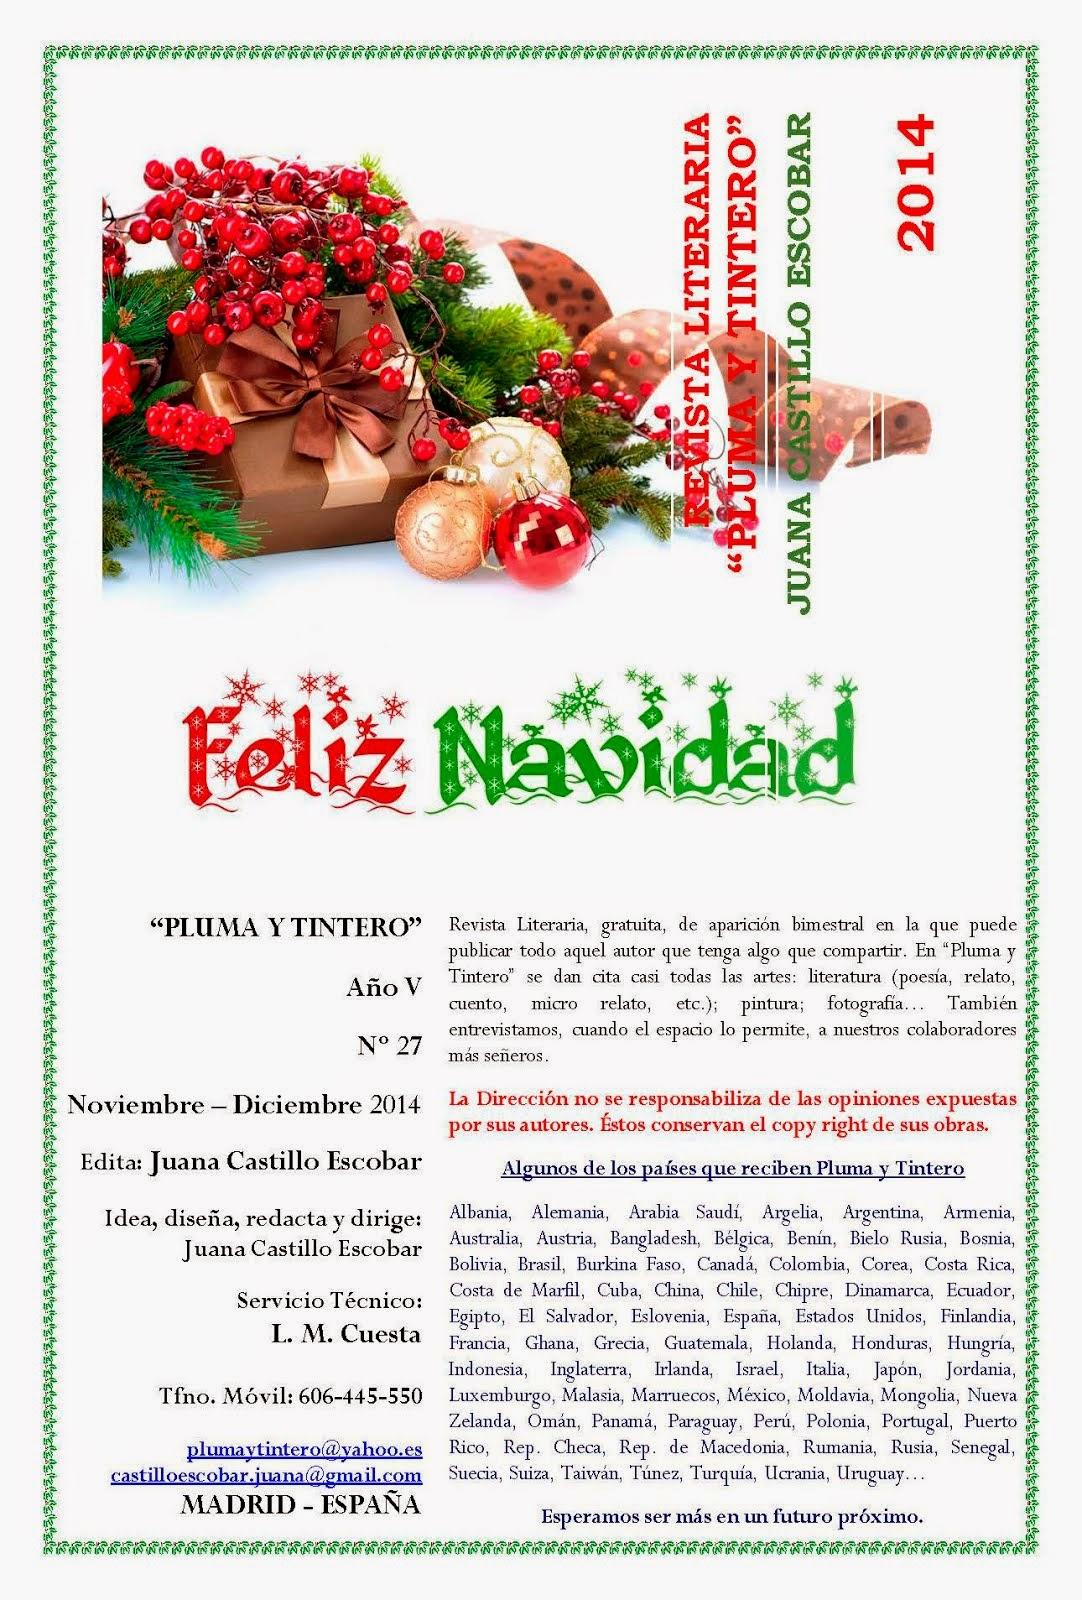 Nº 27 - Año V - Noviembre-Diciembre 2014